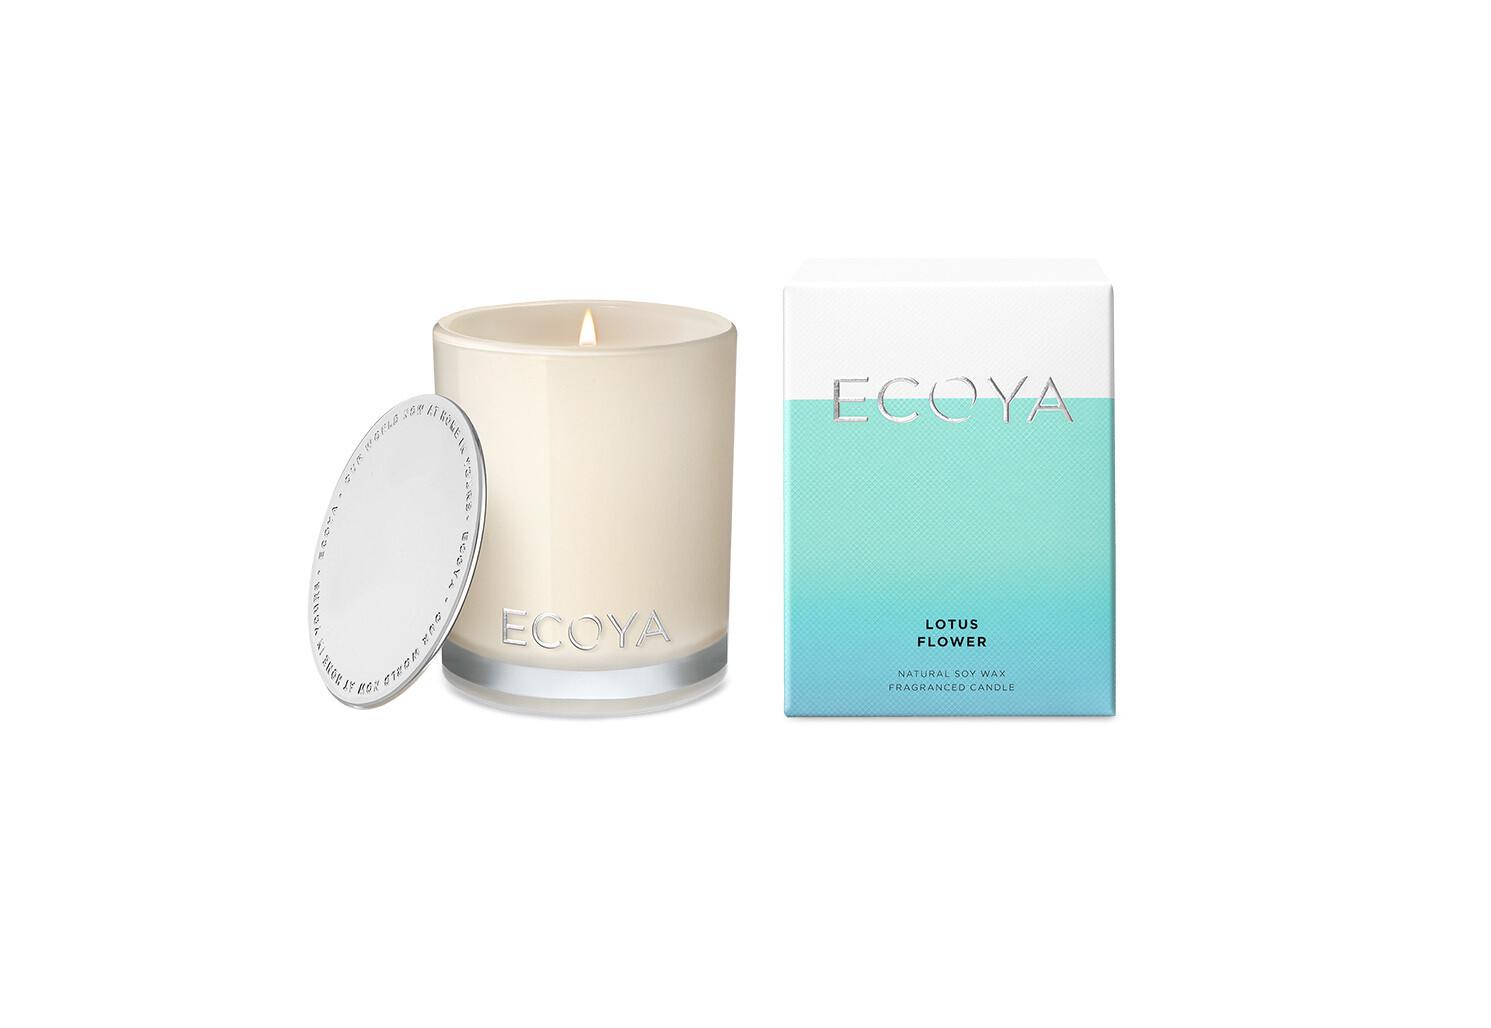 Ecoya Mini Candle - Lotus Flower